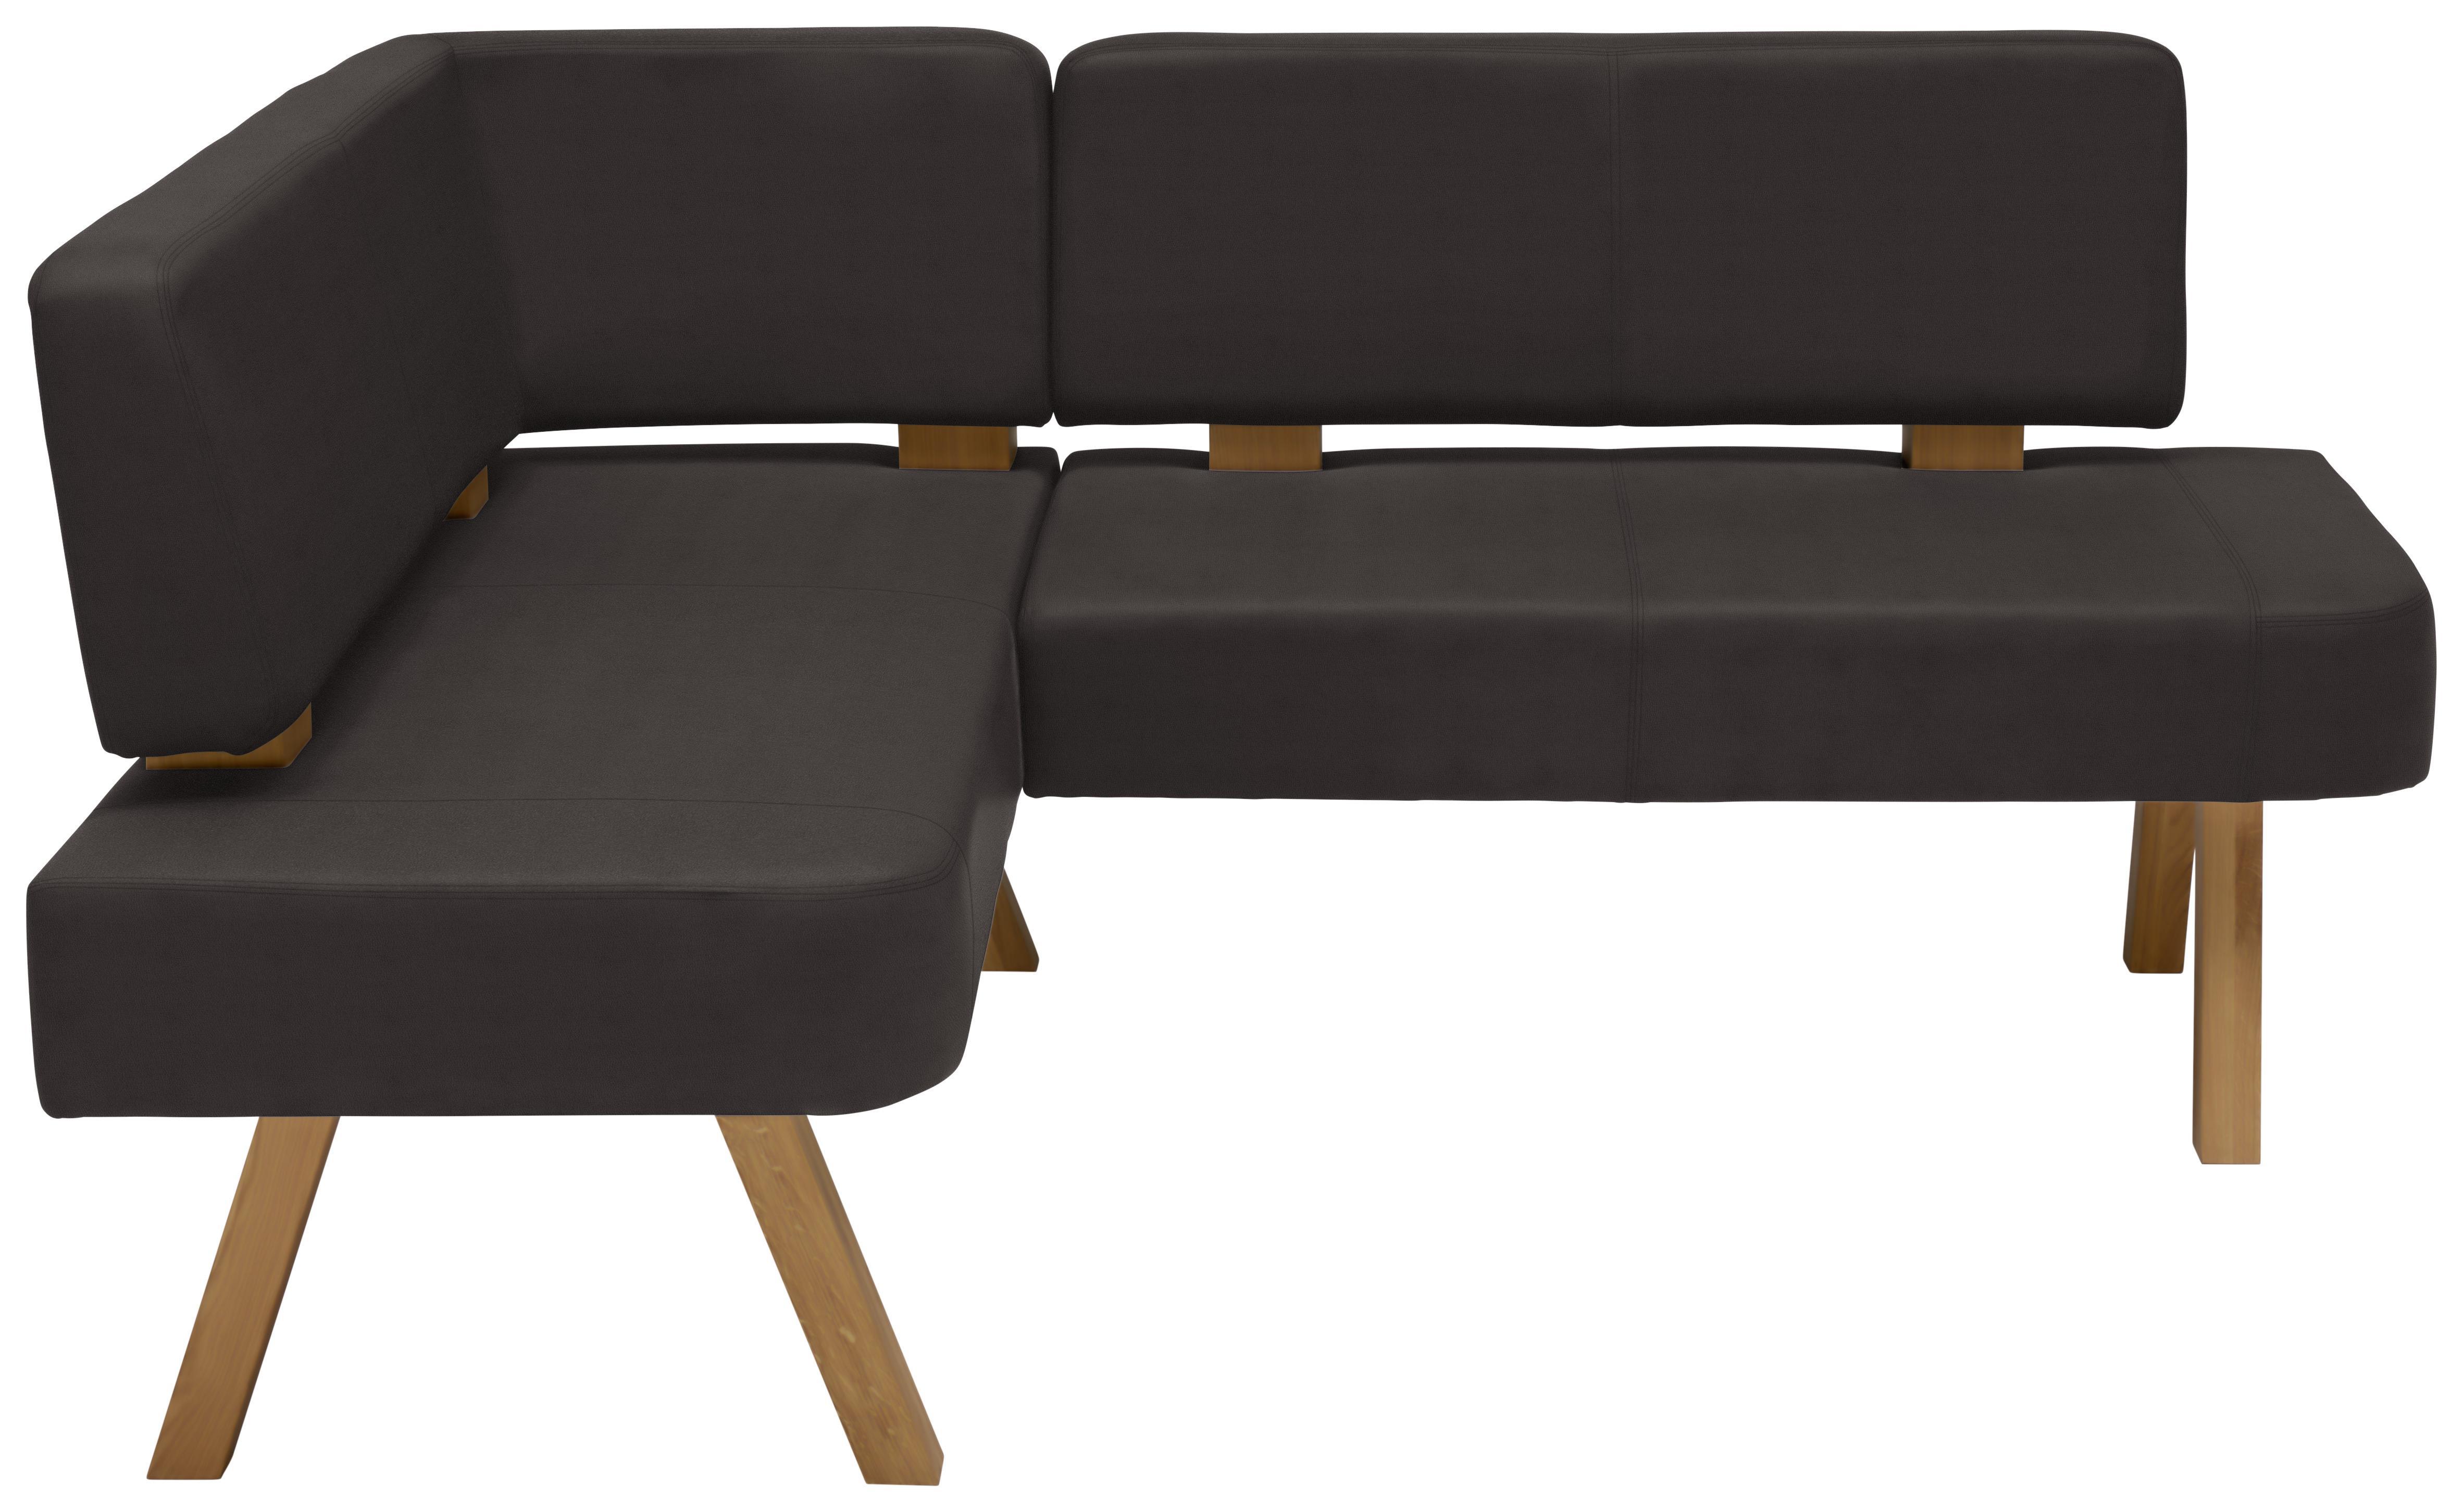 Vladon Sitzm/öbel Eckbank Dallas 170 x 81,5 x 129 cm gepolsterte Kunstleder-Sitzbank in Anthrazit